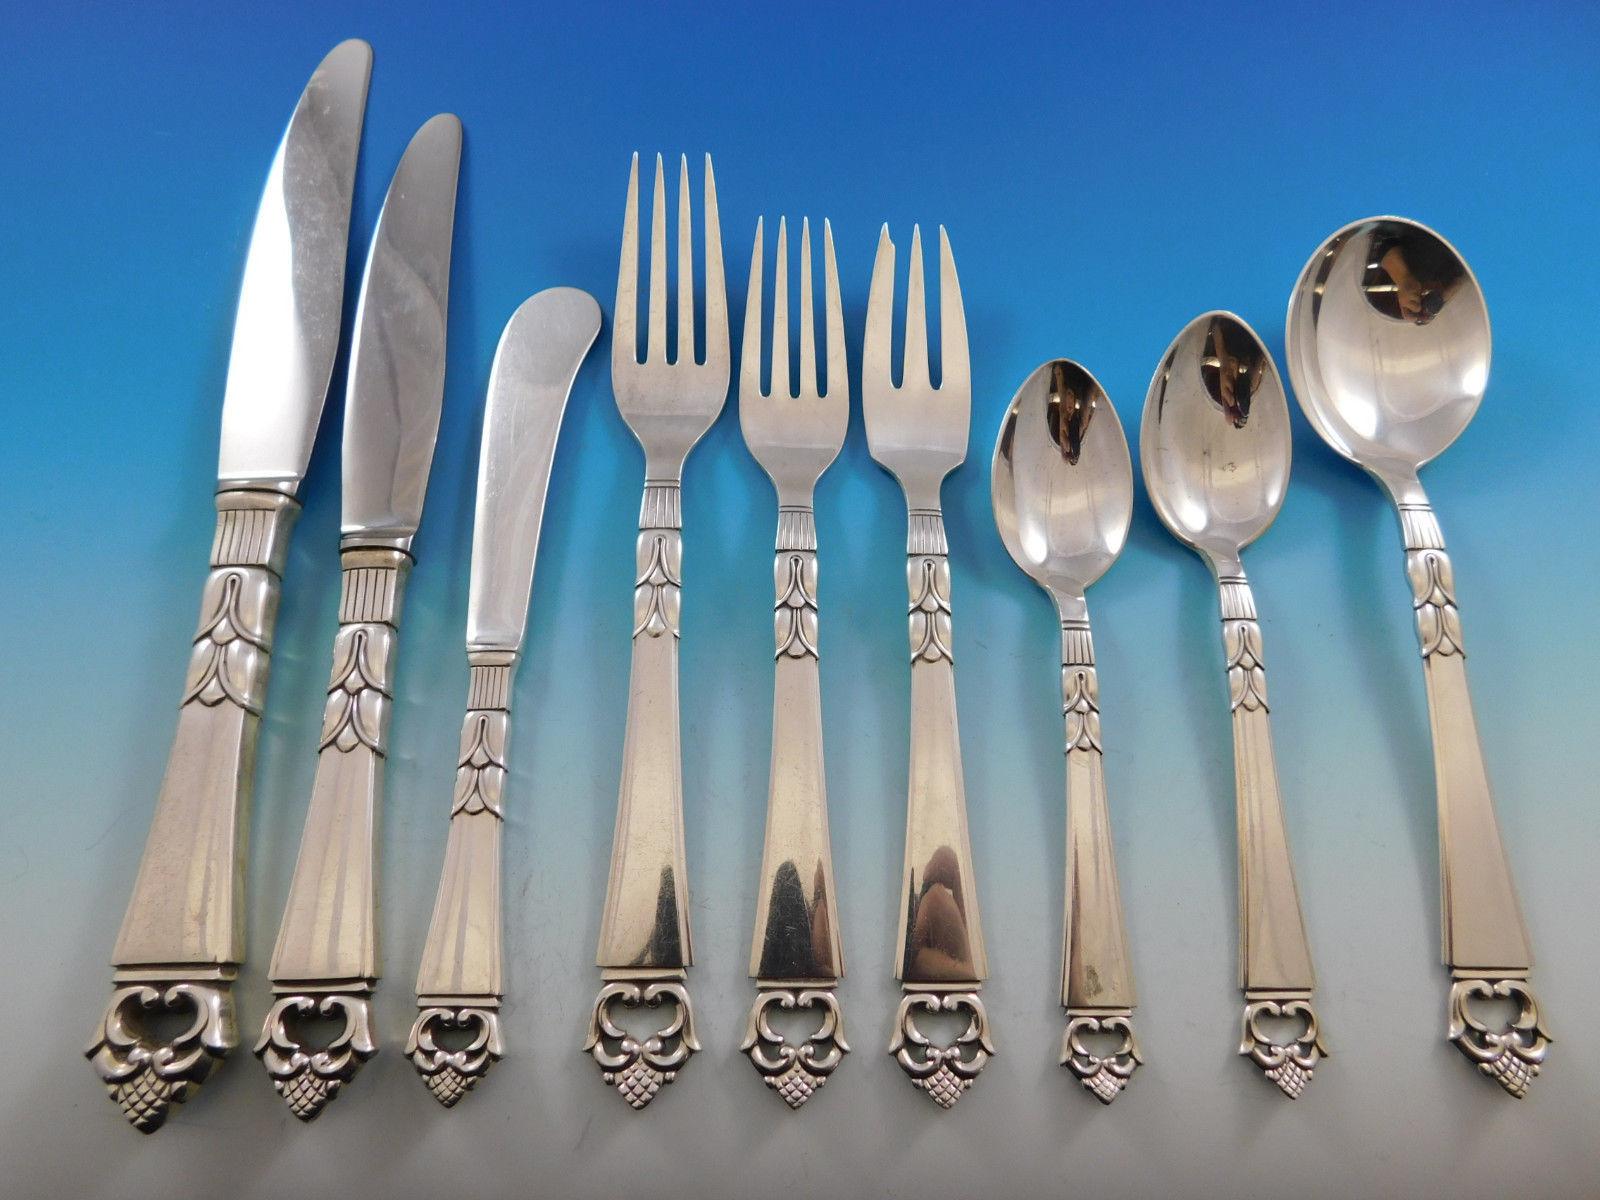 Danish Crown by Frigast Sterling Silver Flatware Service for 8 Set 79 pcs Dinner